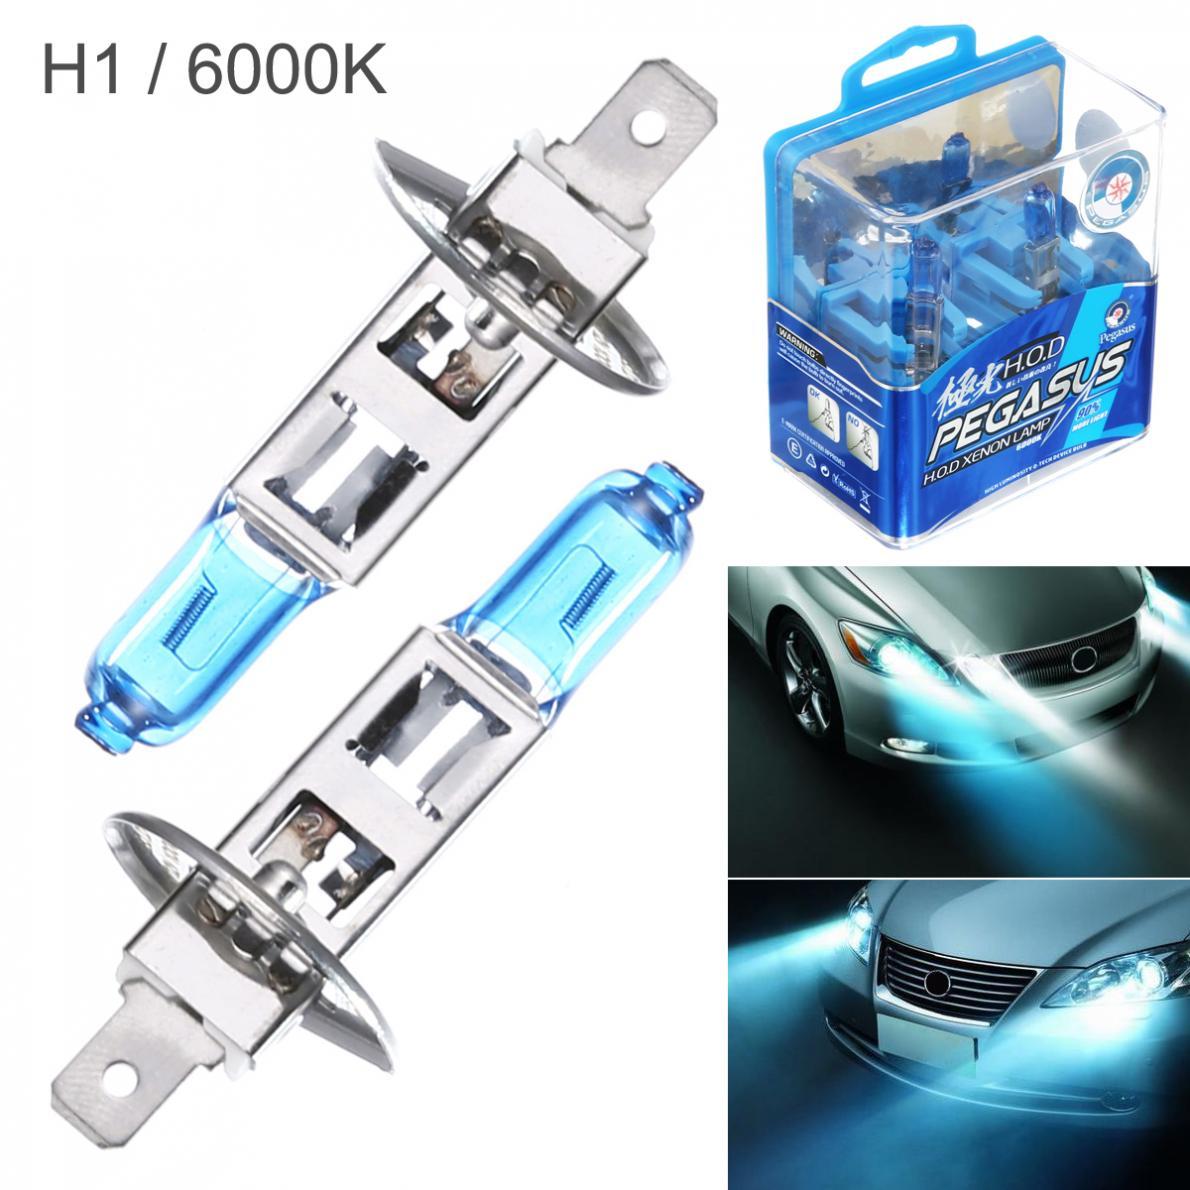 2 шт./лот H1 H3 H4 9005 100 Вт белый свет супер яркий автомобиль HOD ксеноновая галогенная лампа авто передняя фара противотуманная лампа